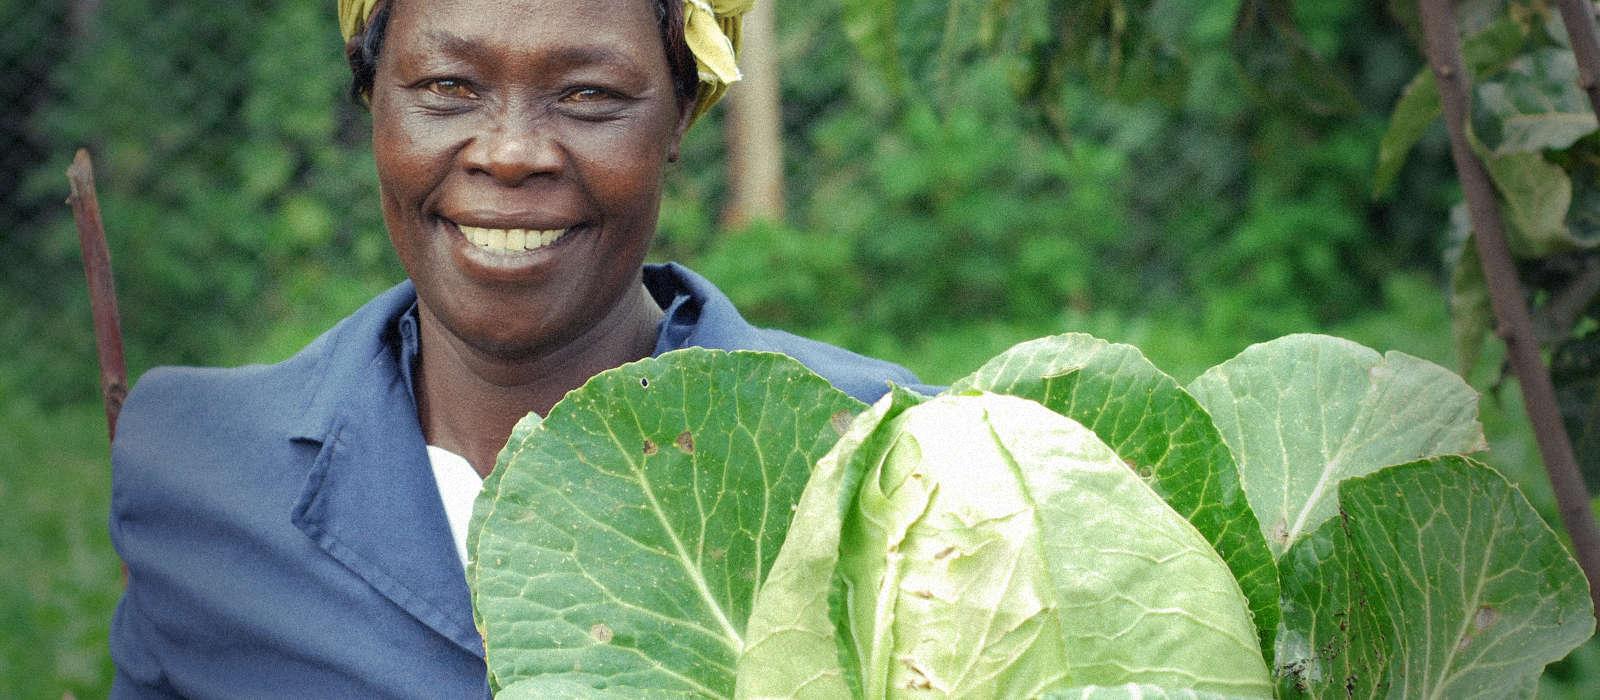 Uplifting Food Communities